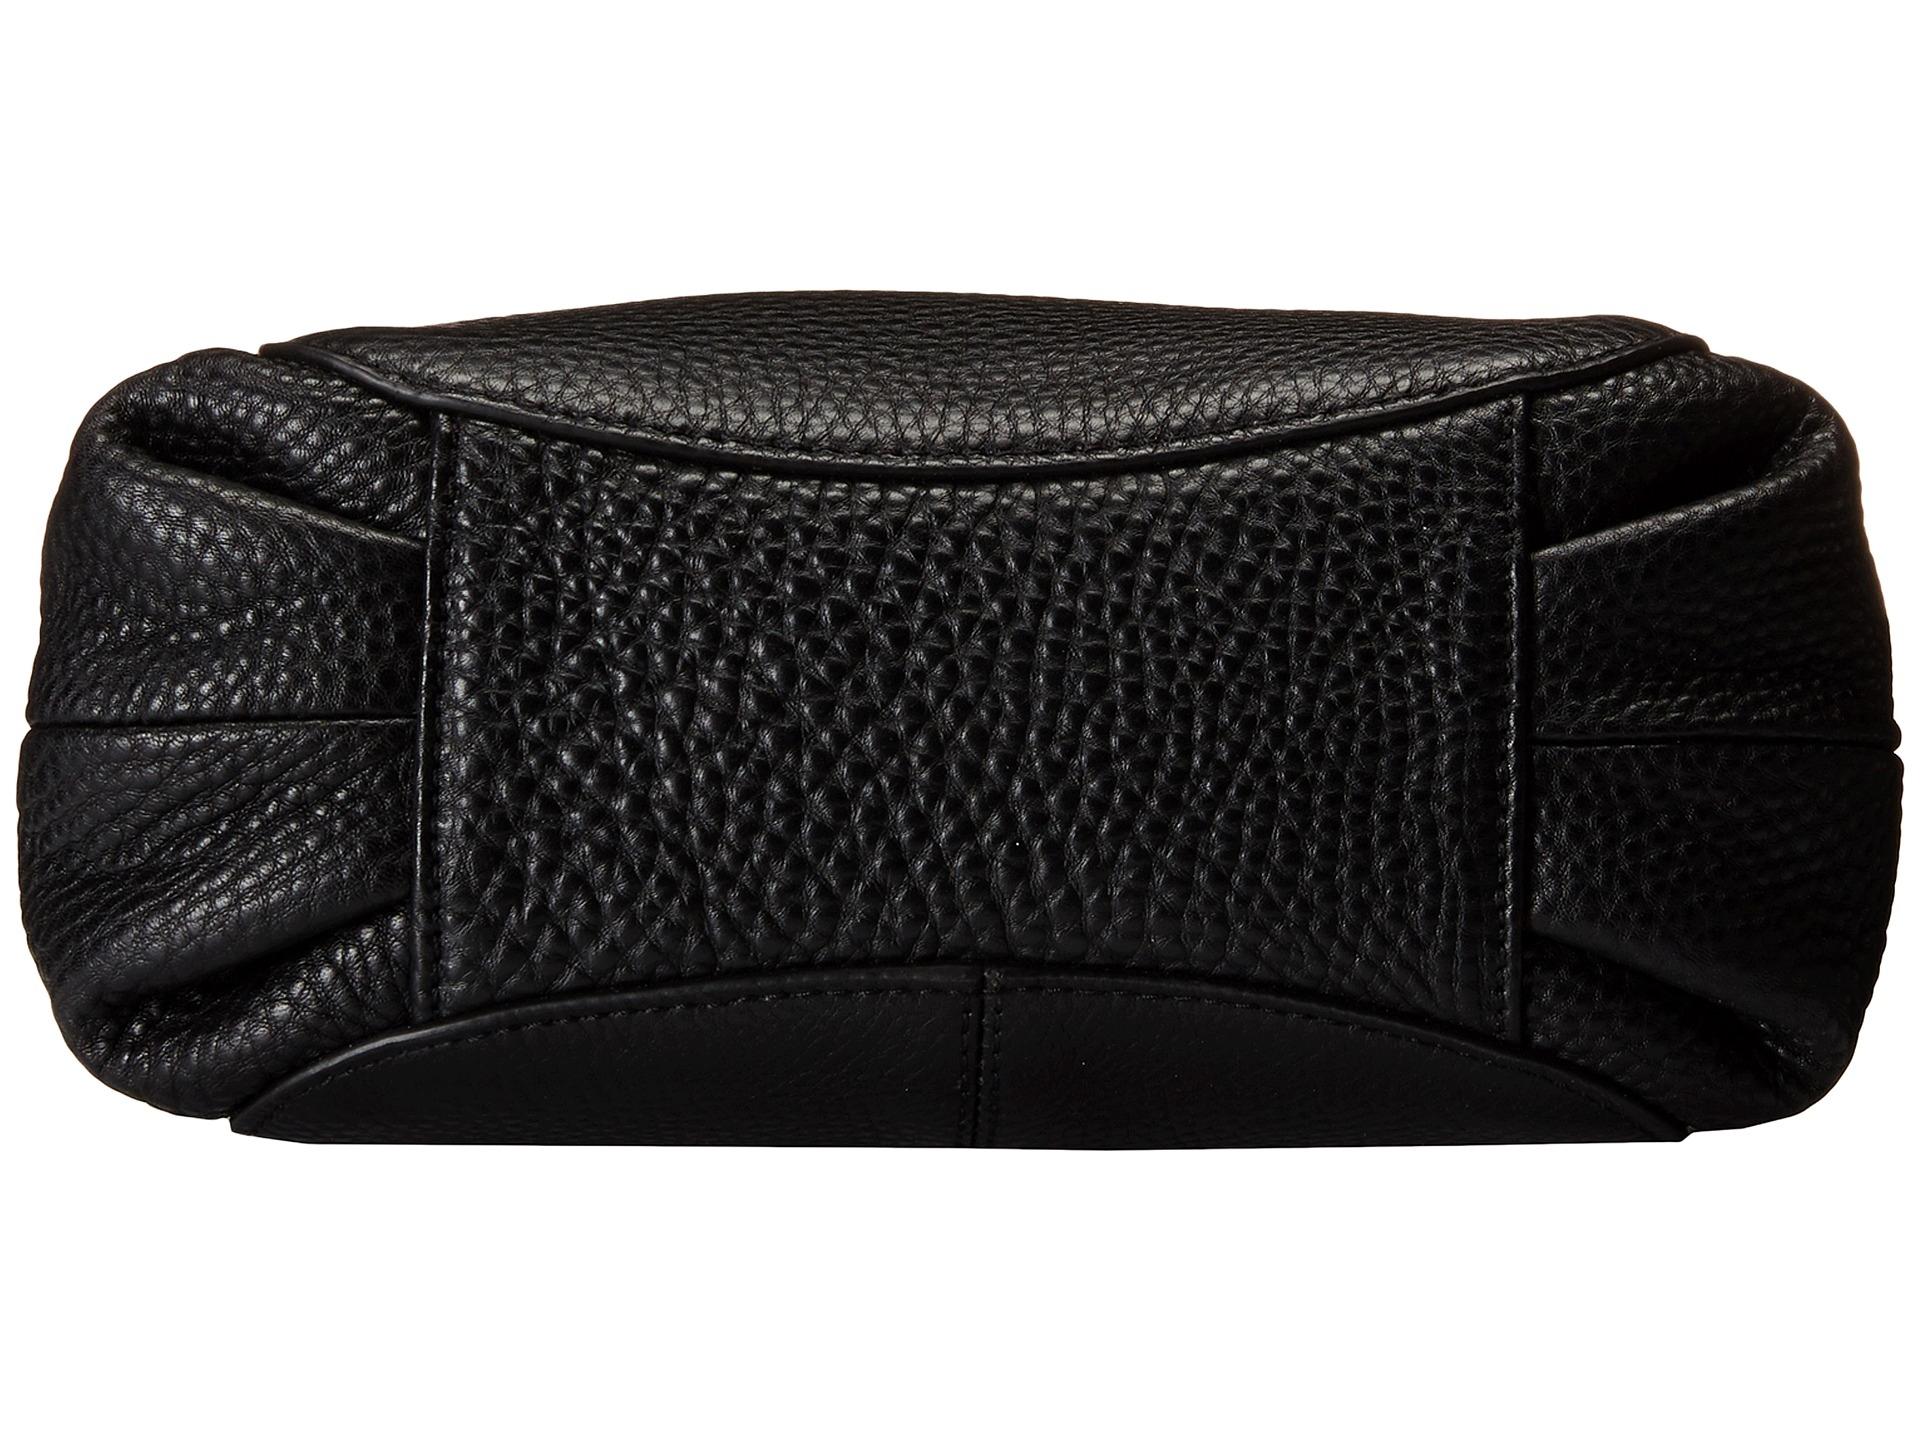 Versace Käsilaukku : Dkny laukut k?silaukku b